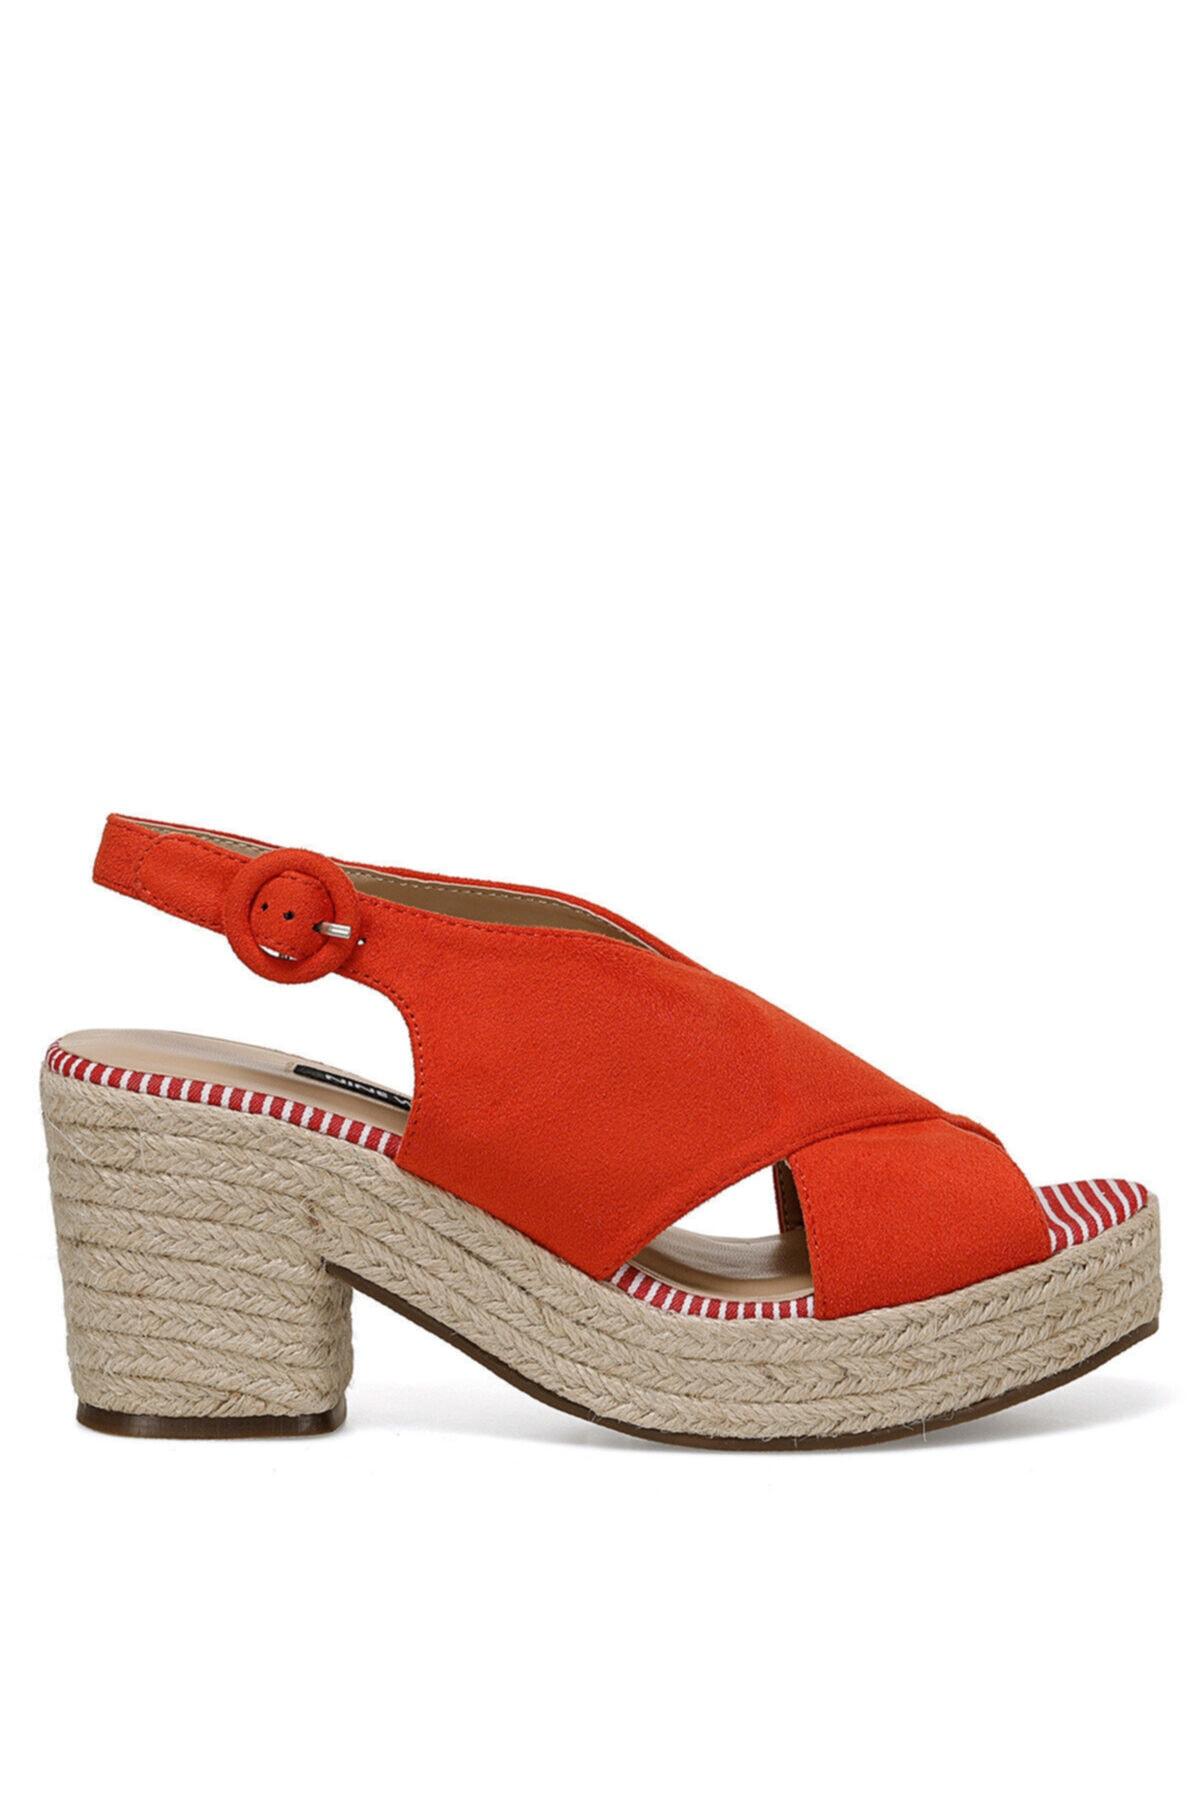 Nine West NORMINA Turuncu Kadın Dolgu Topuk Sandalet 100524805 1